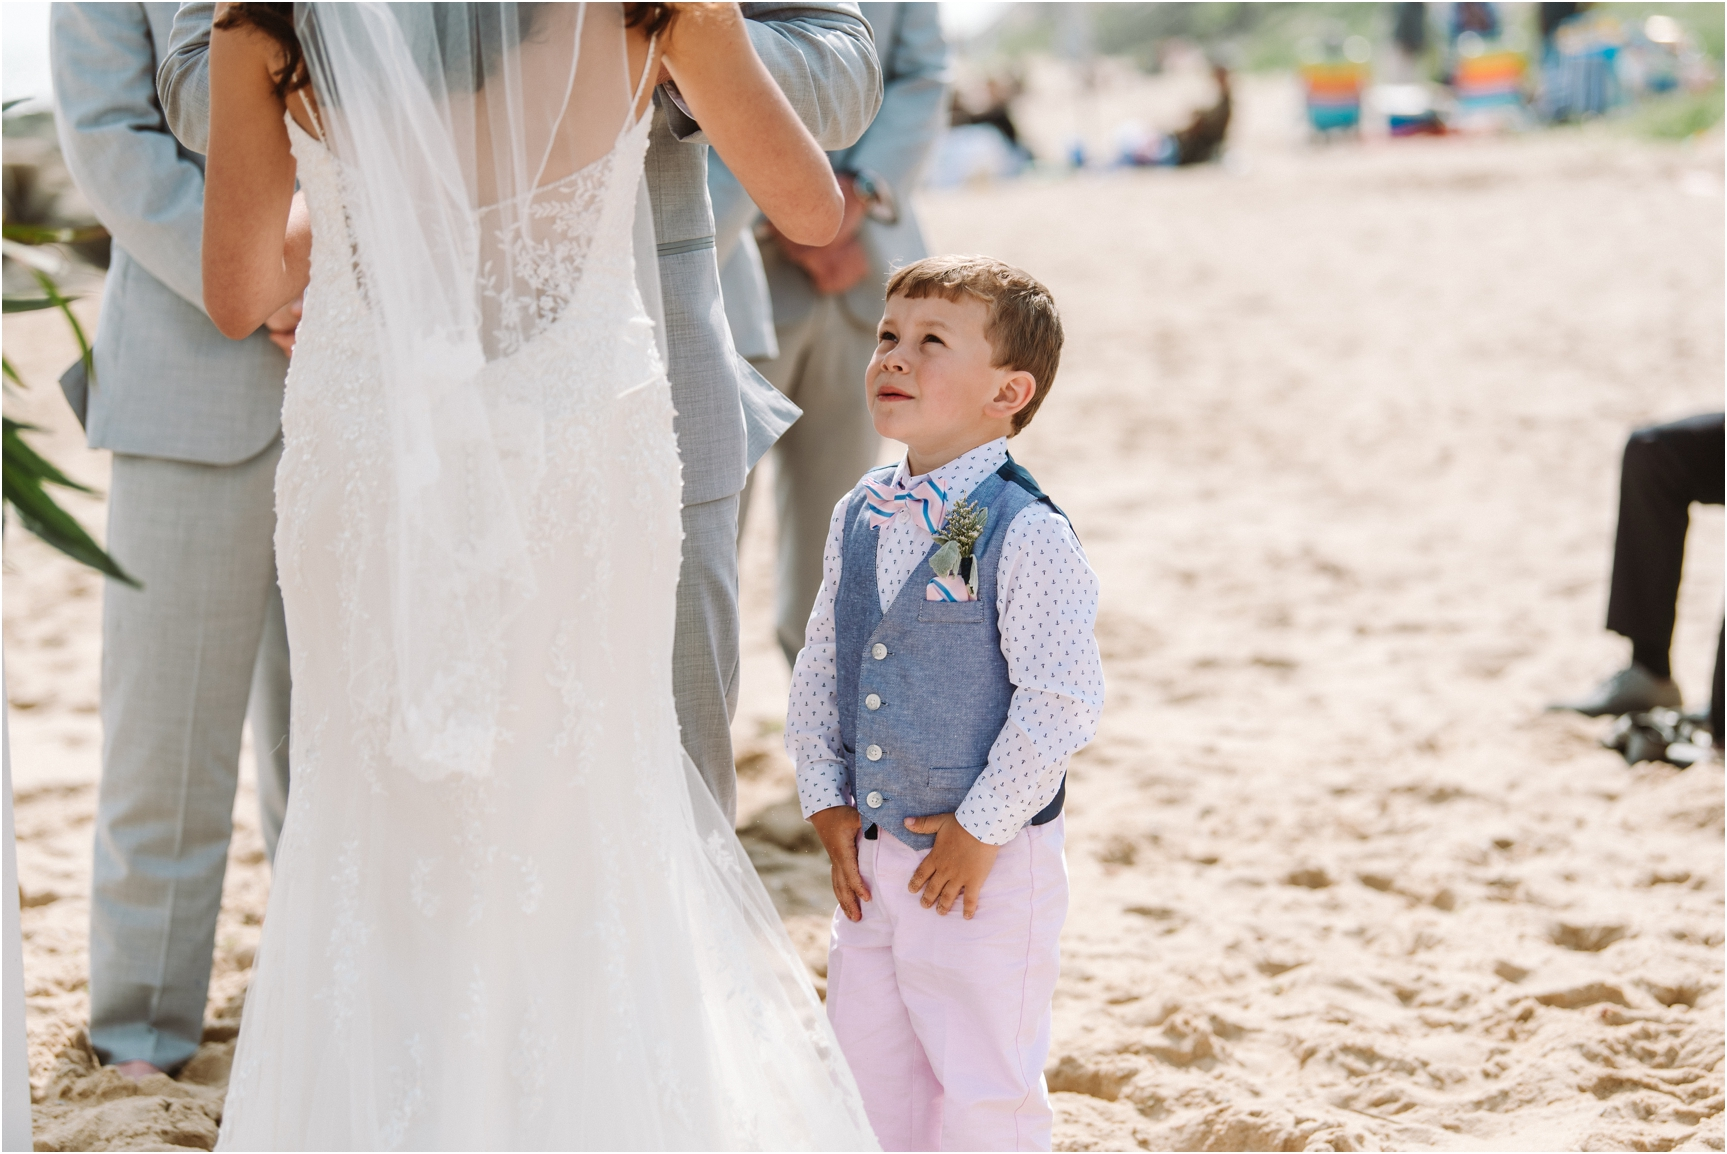 Sarah & Sam Pelham House Cape Cod Wedding Photographer-99.jpg